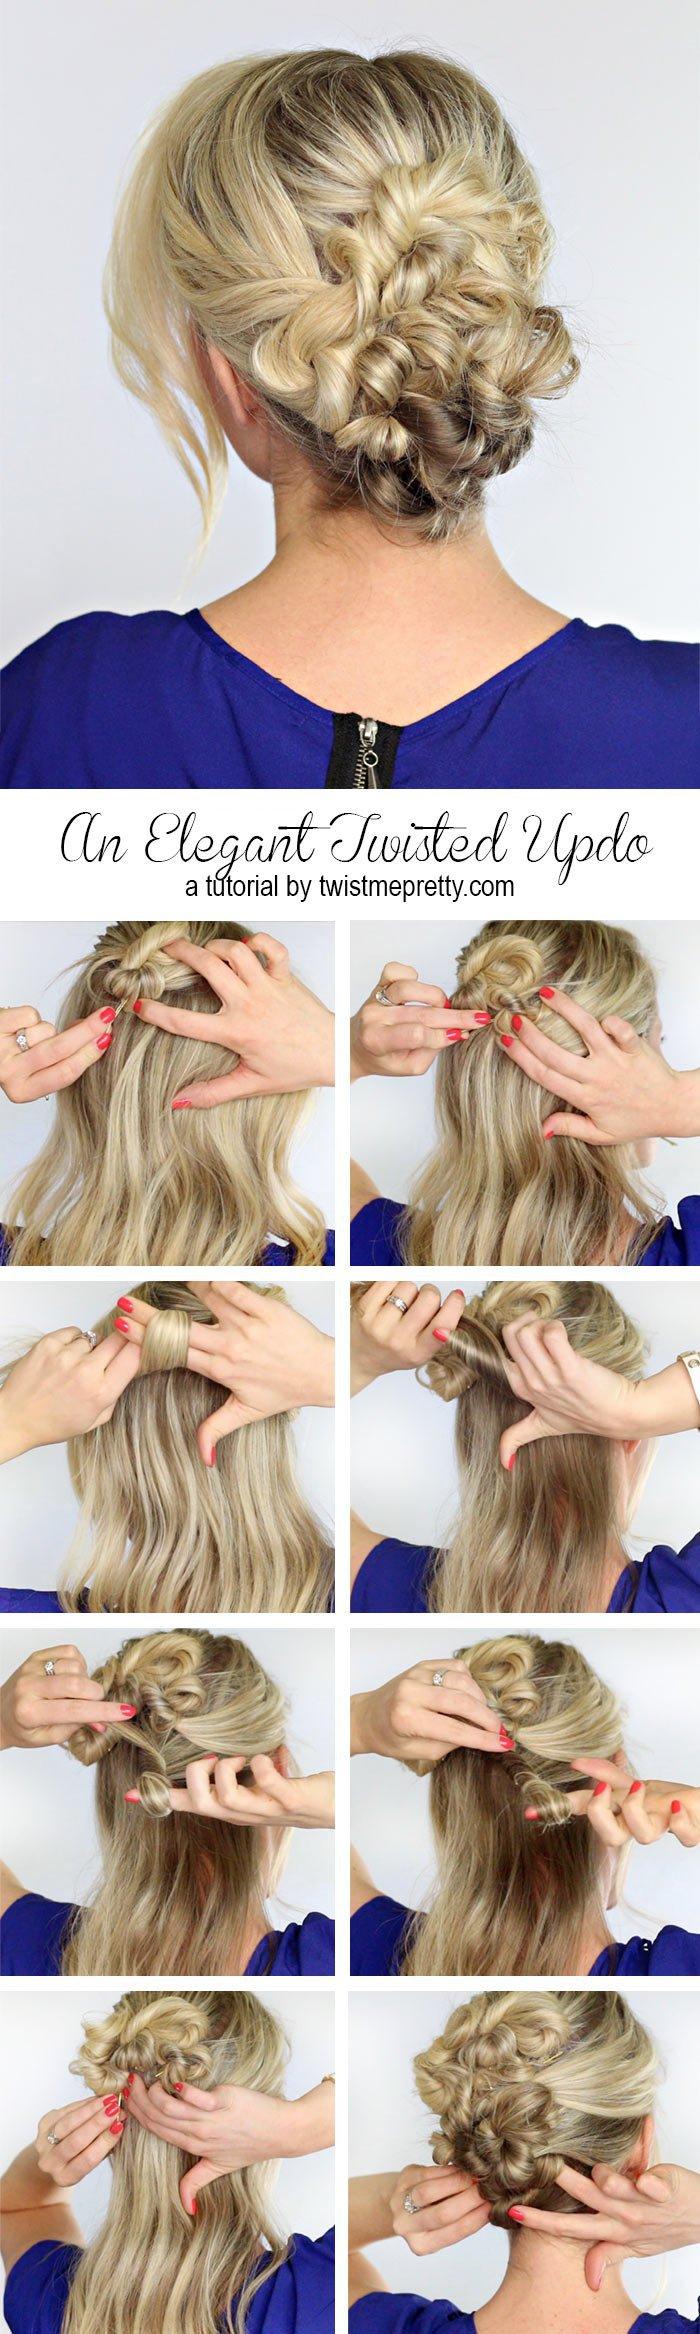 easy yet trendy hairstyle tutorials you will love tutorials